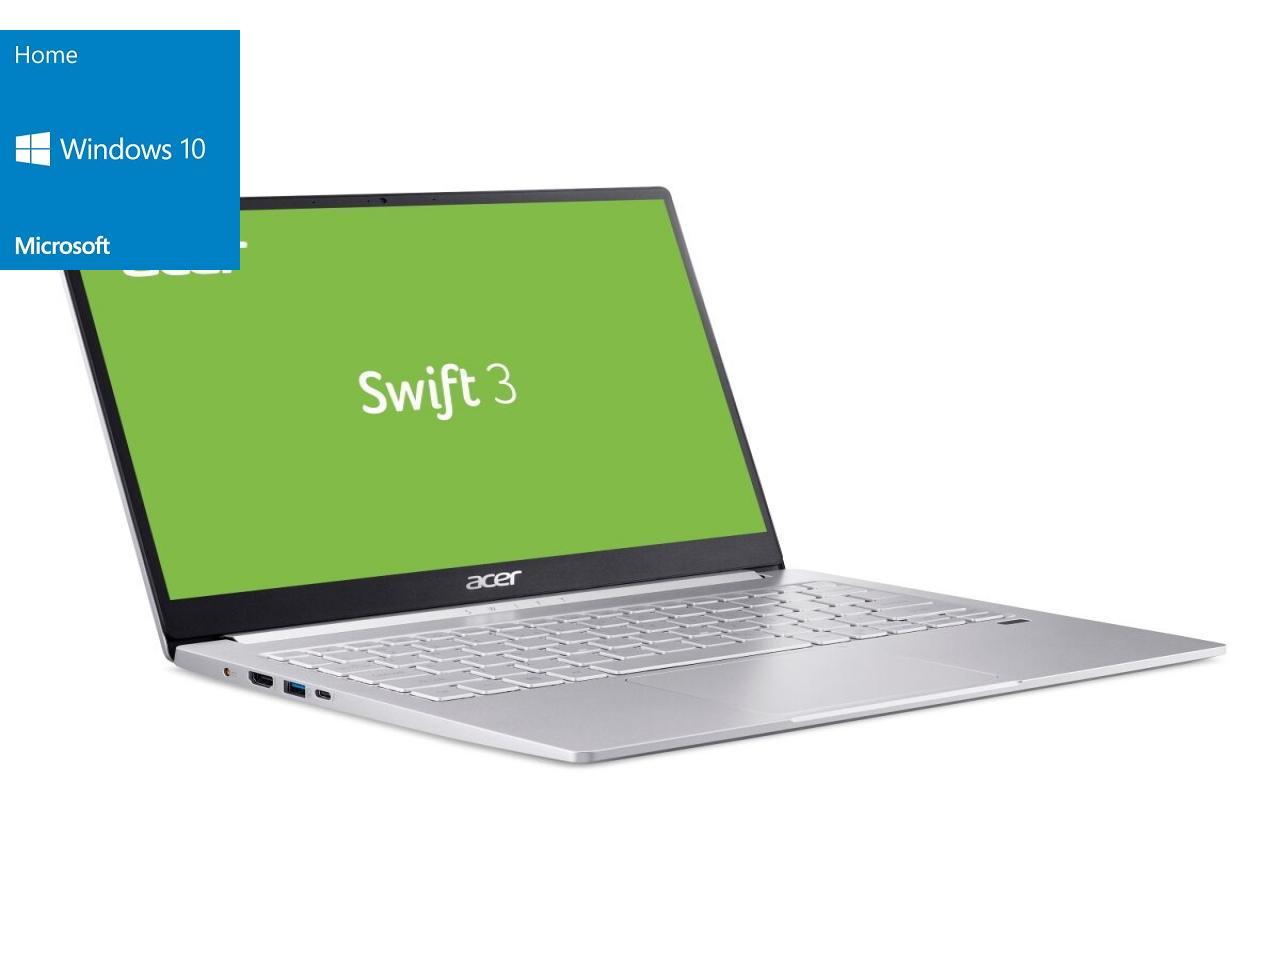 Acer Acer Swift 3 SF313-52-71Y7